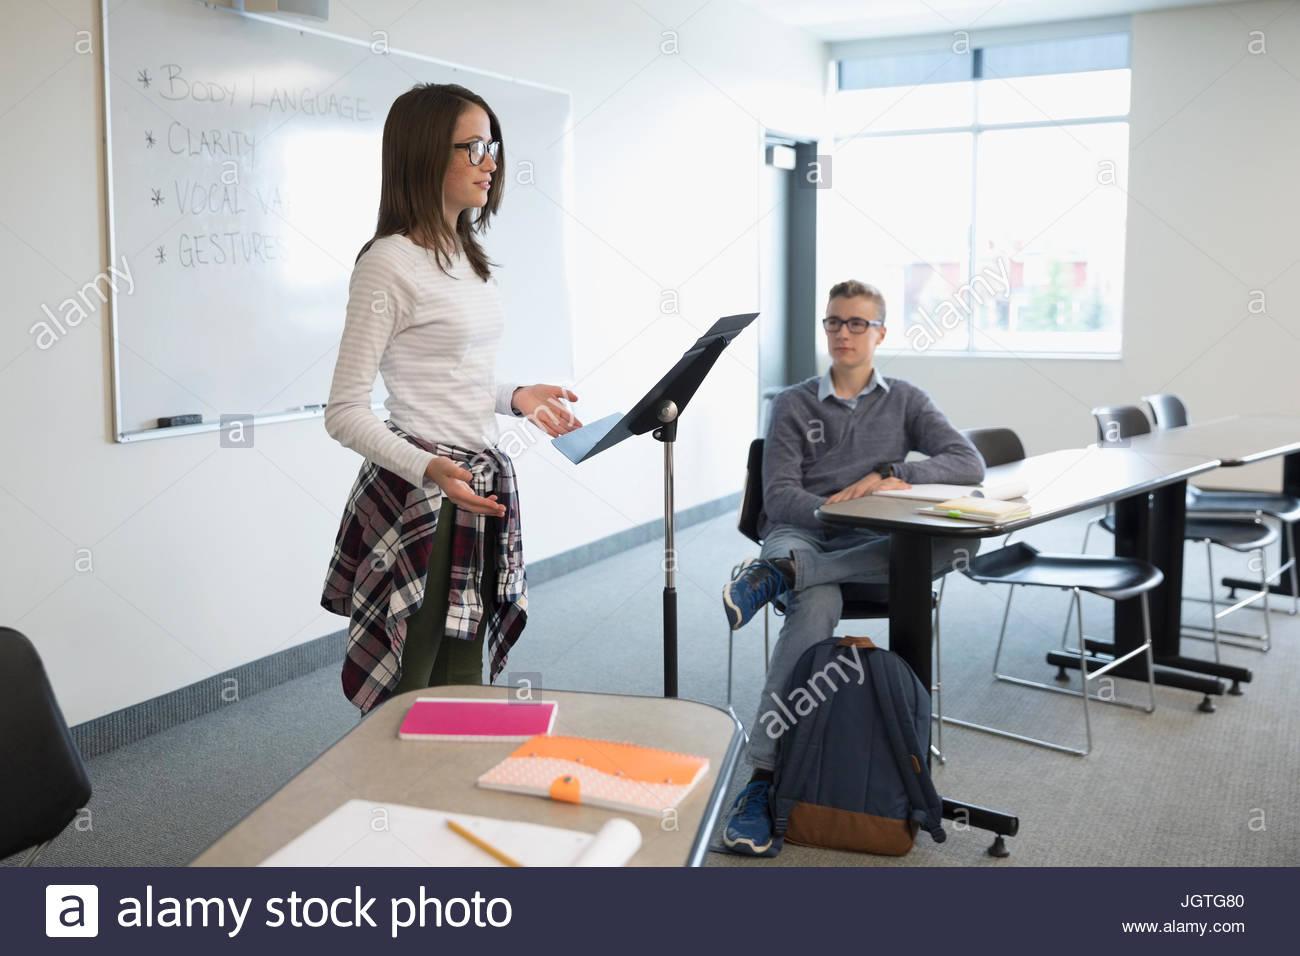 Girl middle school student speaking in debate club in classroom - Stock Image